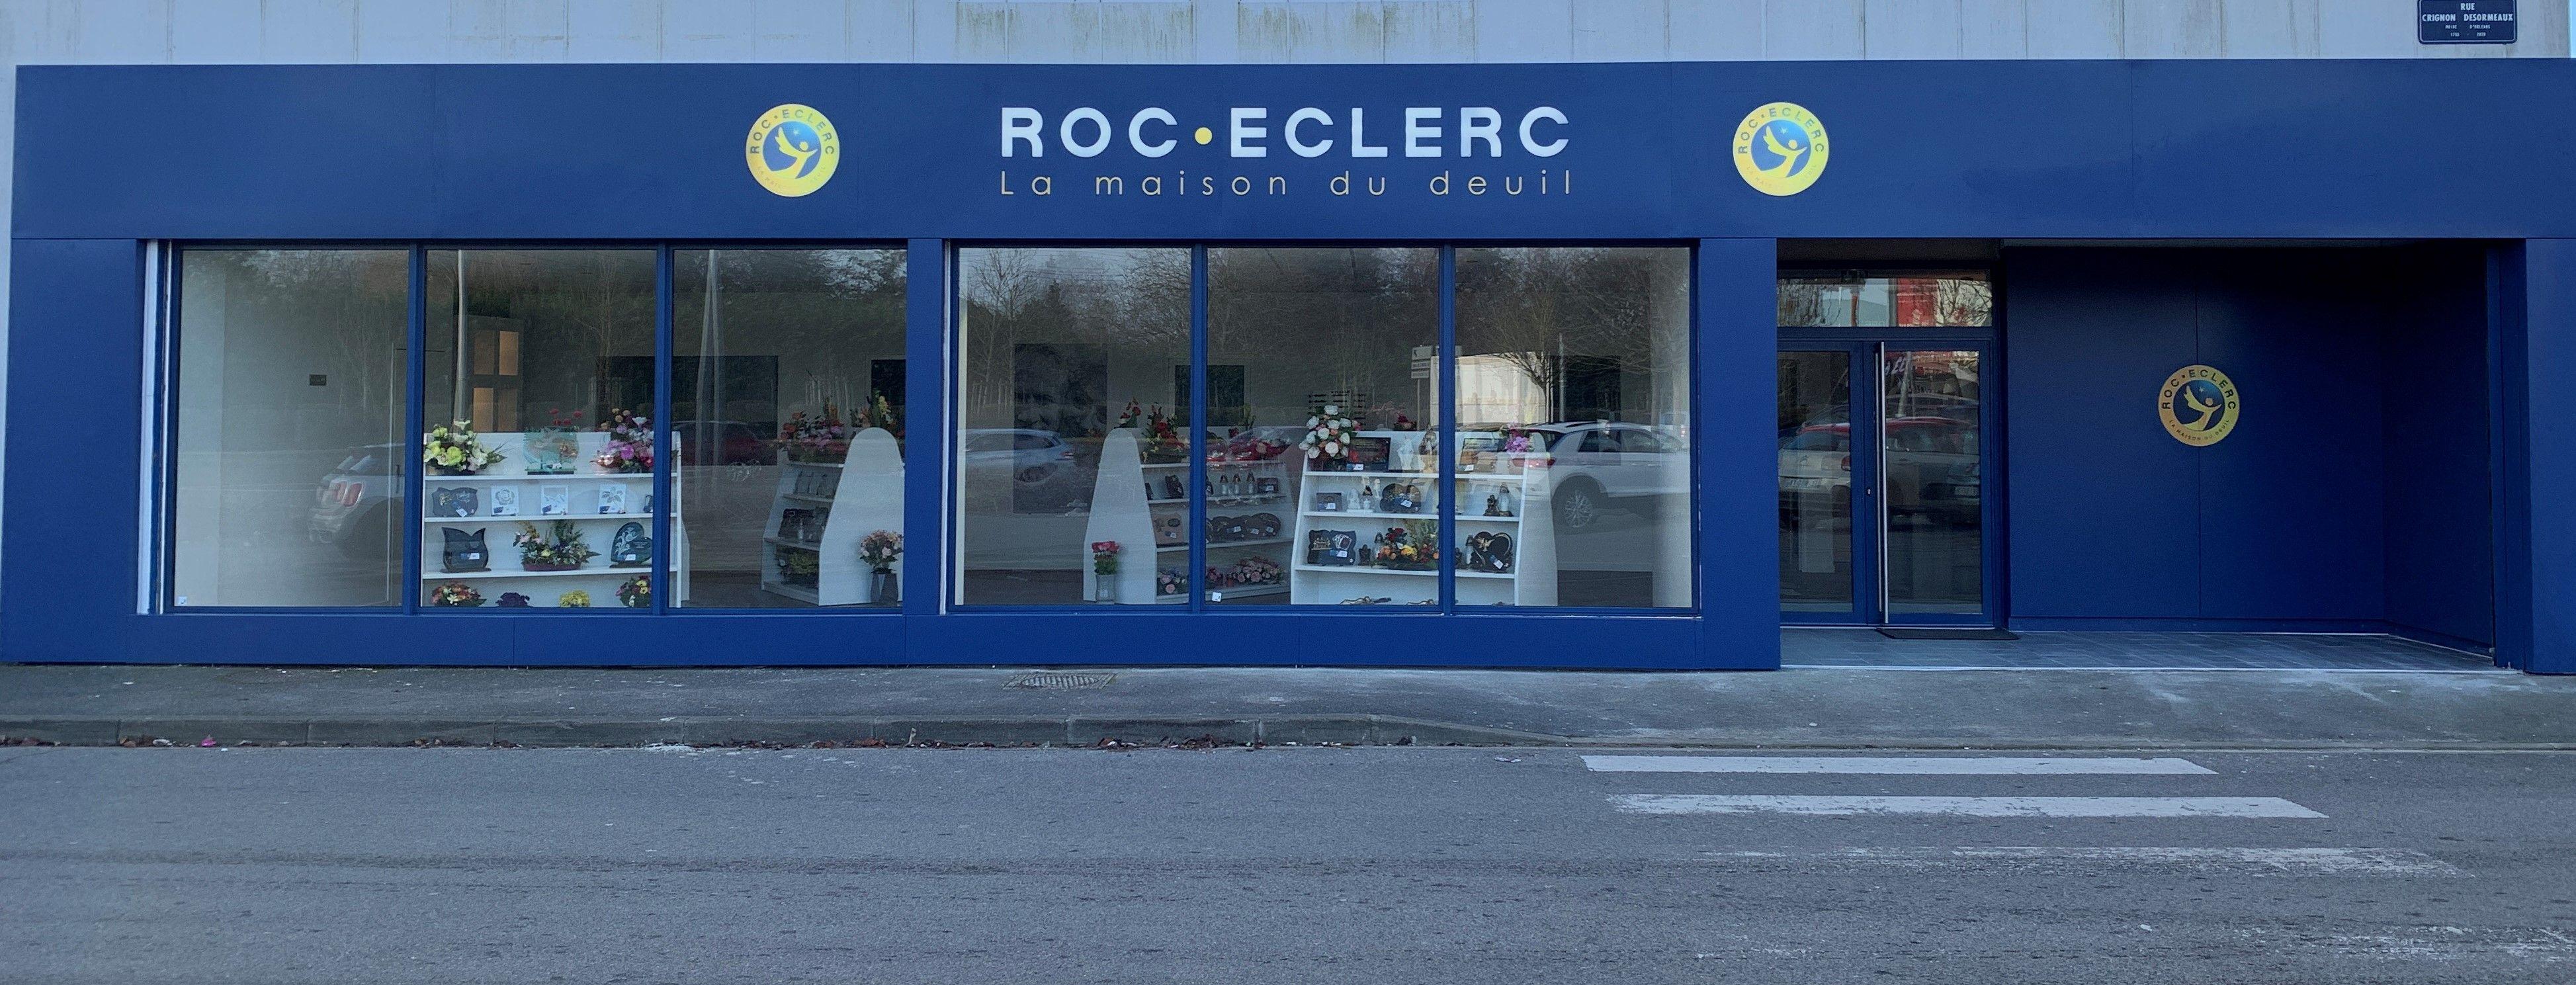 agence ROC ECLERC Orléans façade